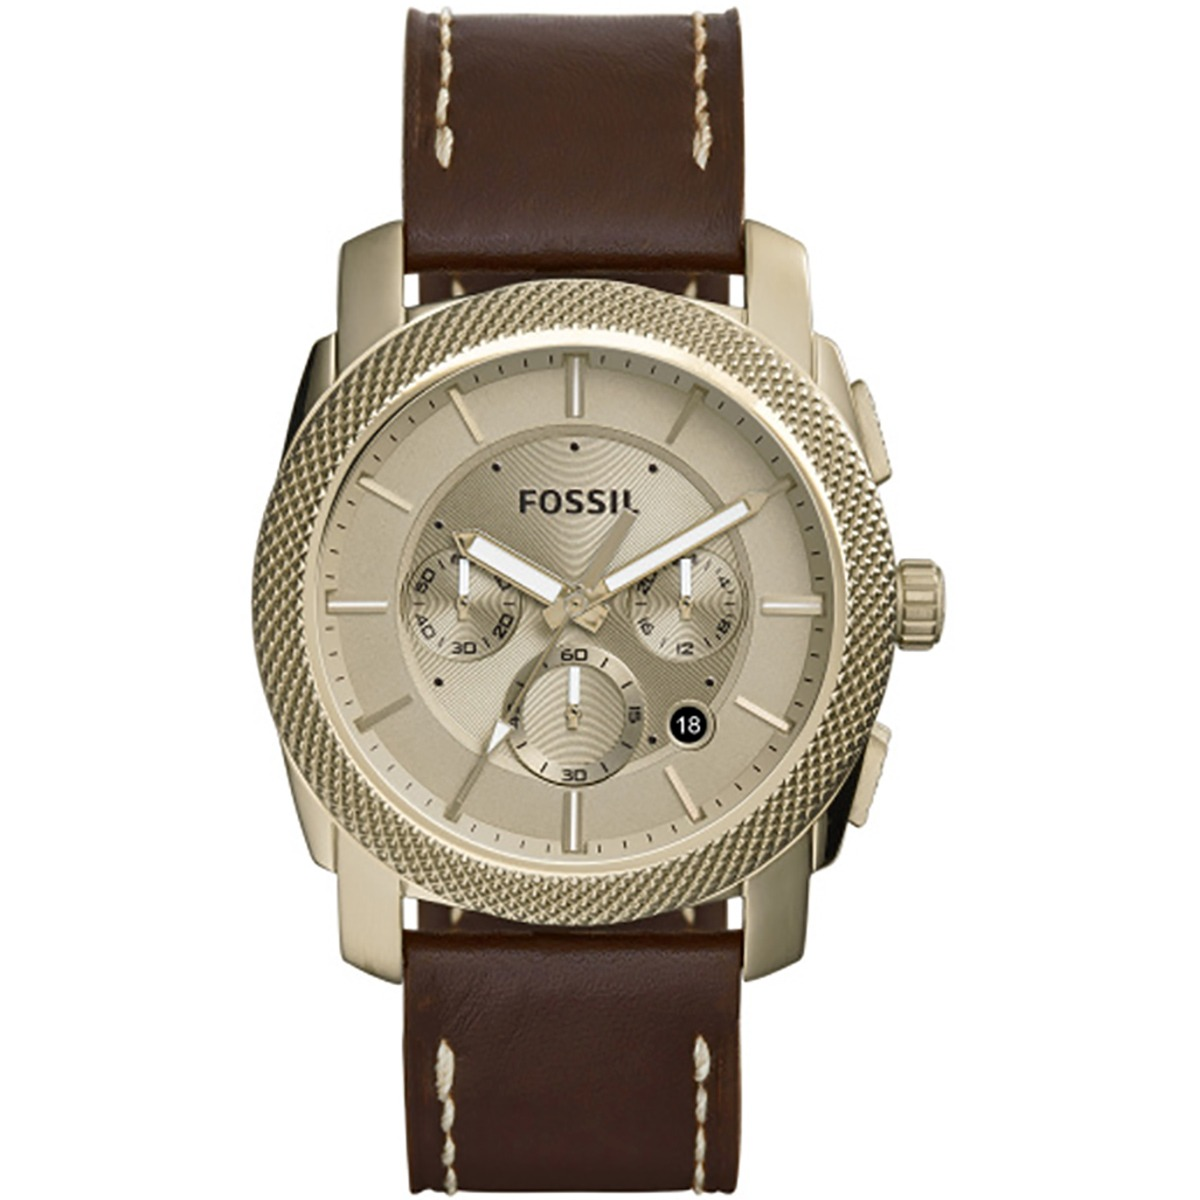 390c79557eb Relógio Fossil Masculino Fs5075 0dn. - R  752